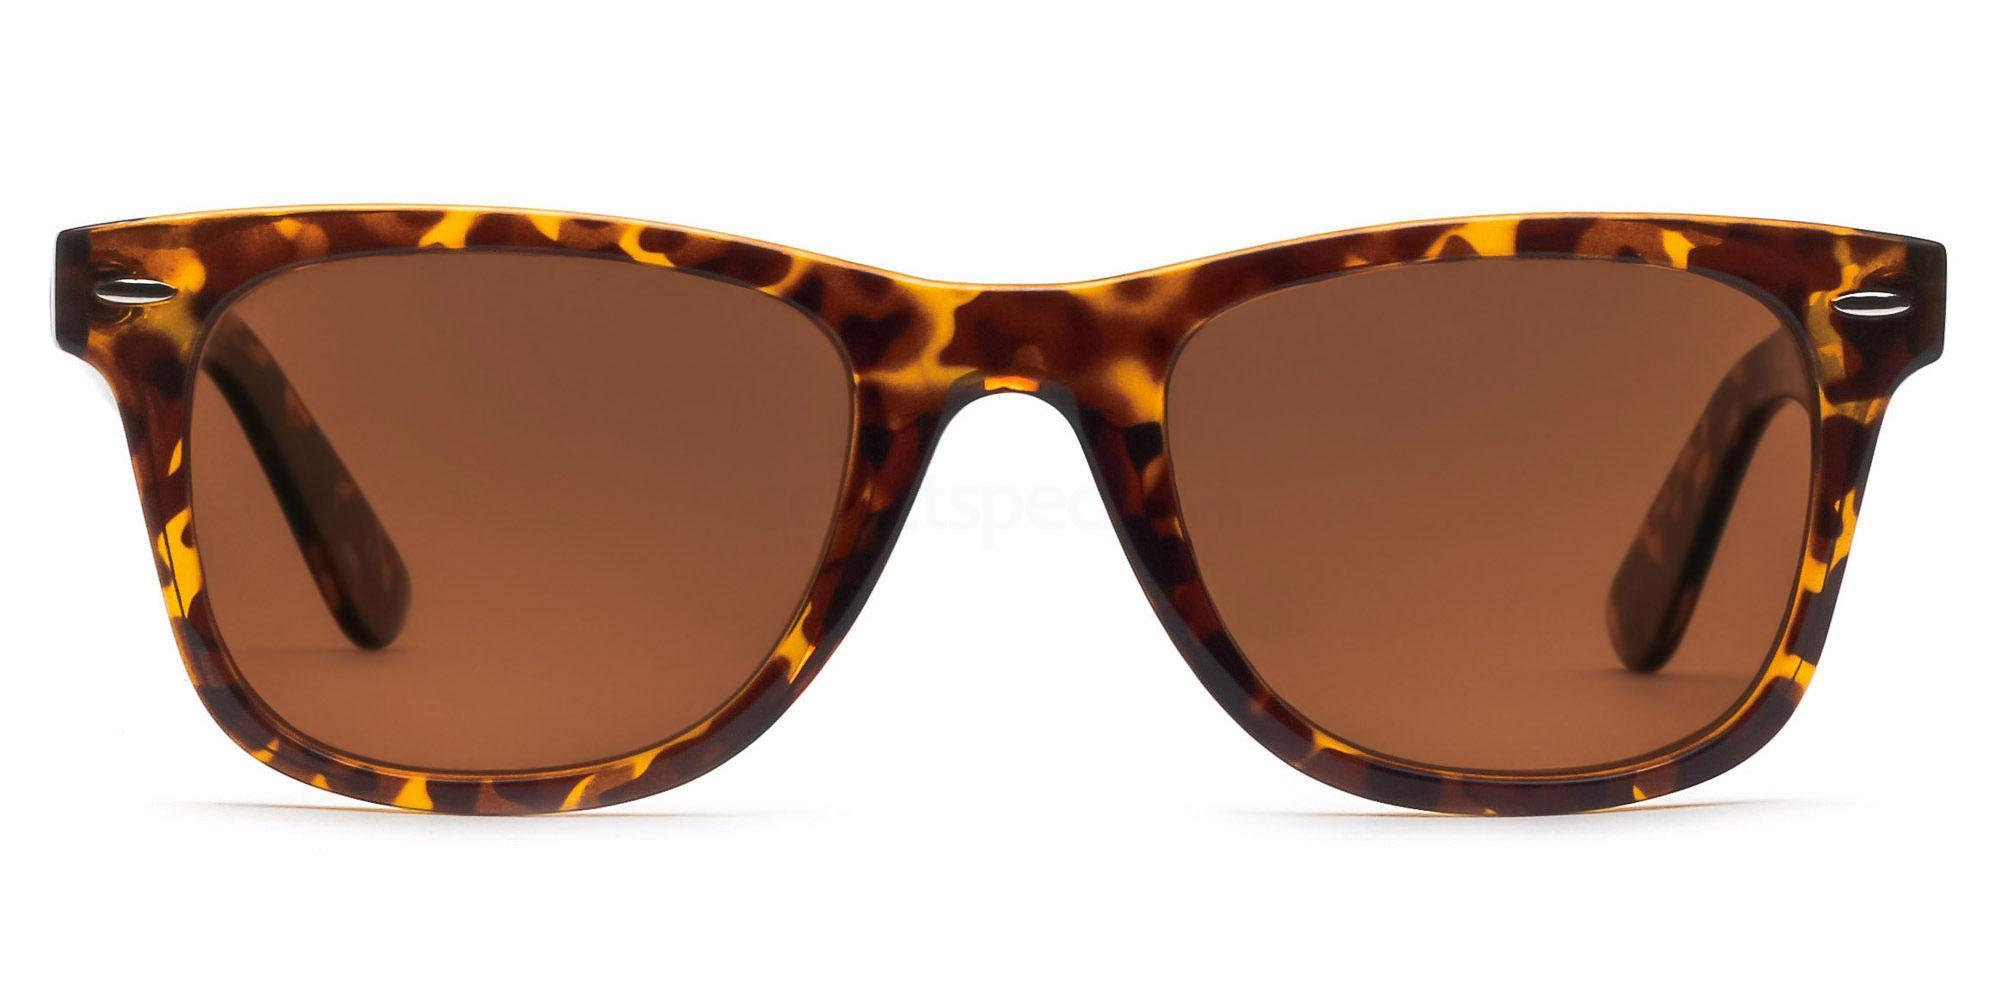 C04 Polarized Brown P2429 - Havana (Polarized) Sunglasses, Savannah